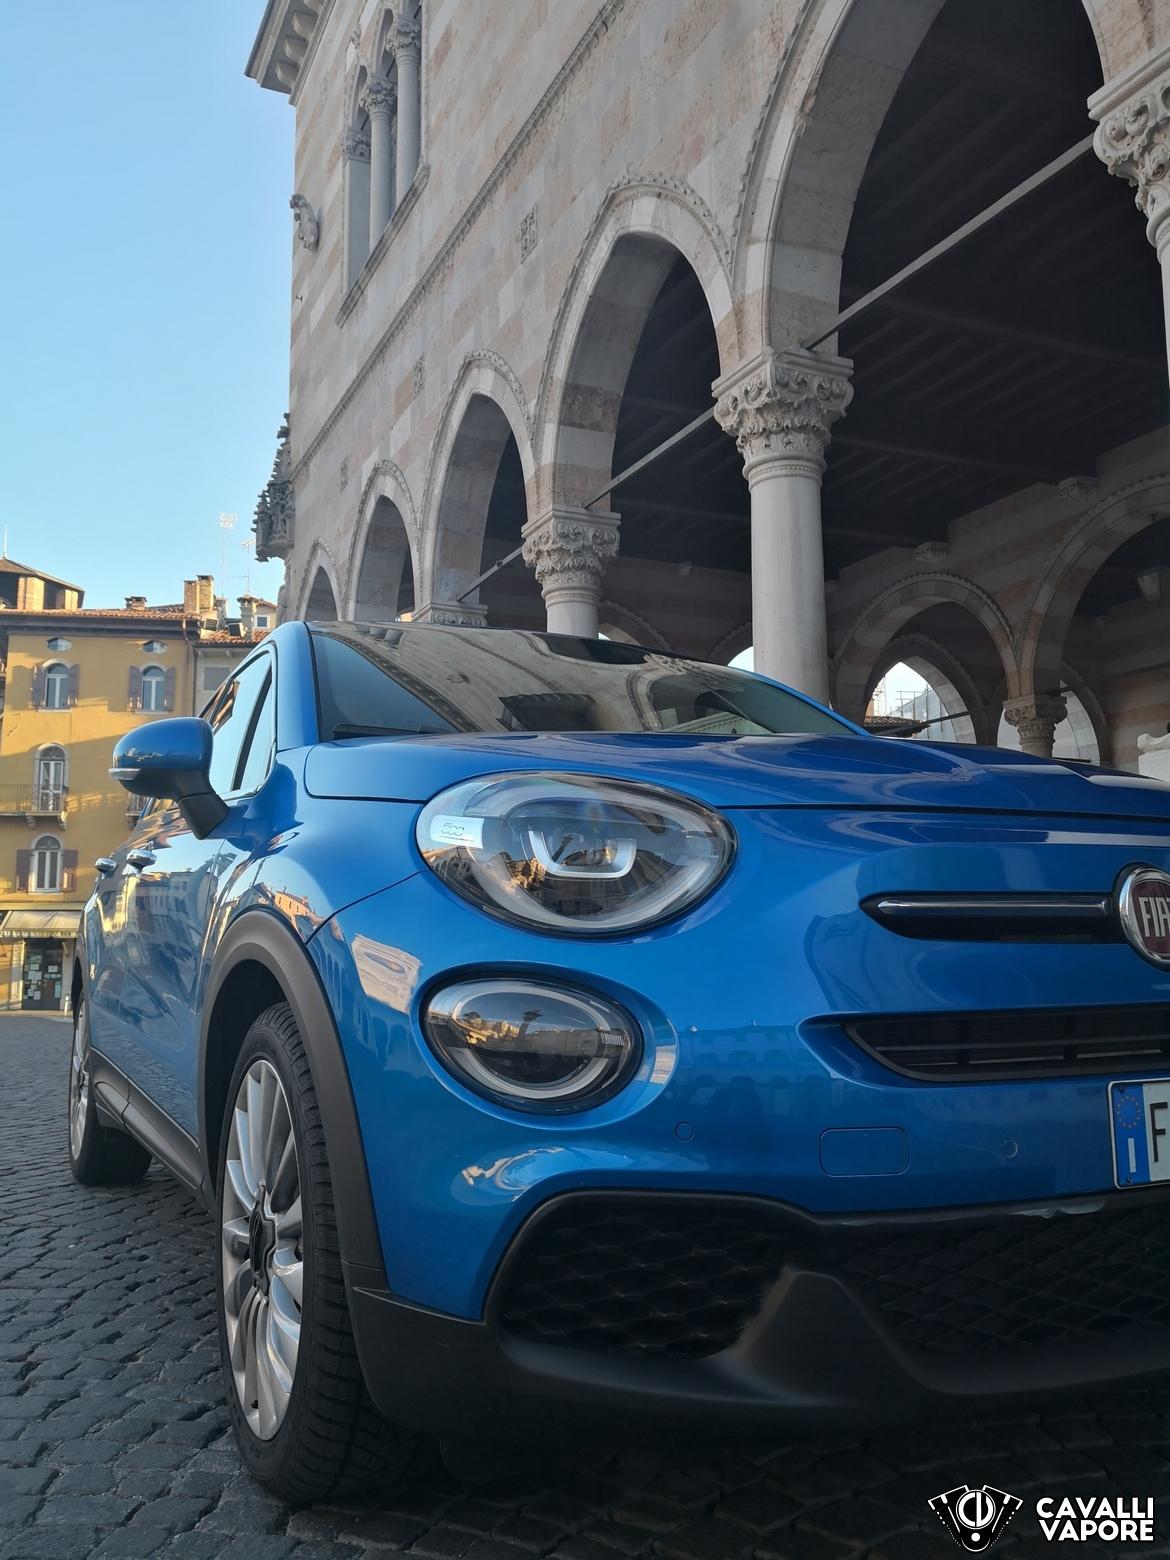 Fiat 500X Urban Dettaglio Esterno Piazza Udine